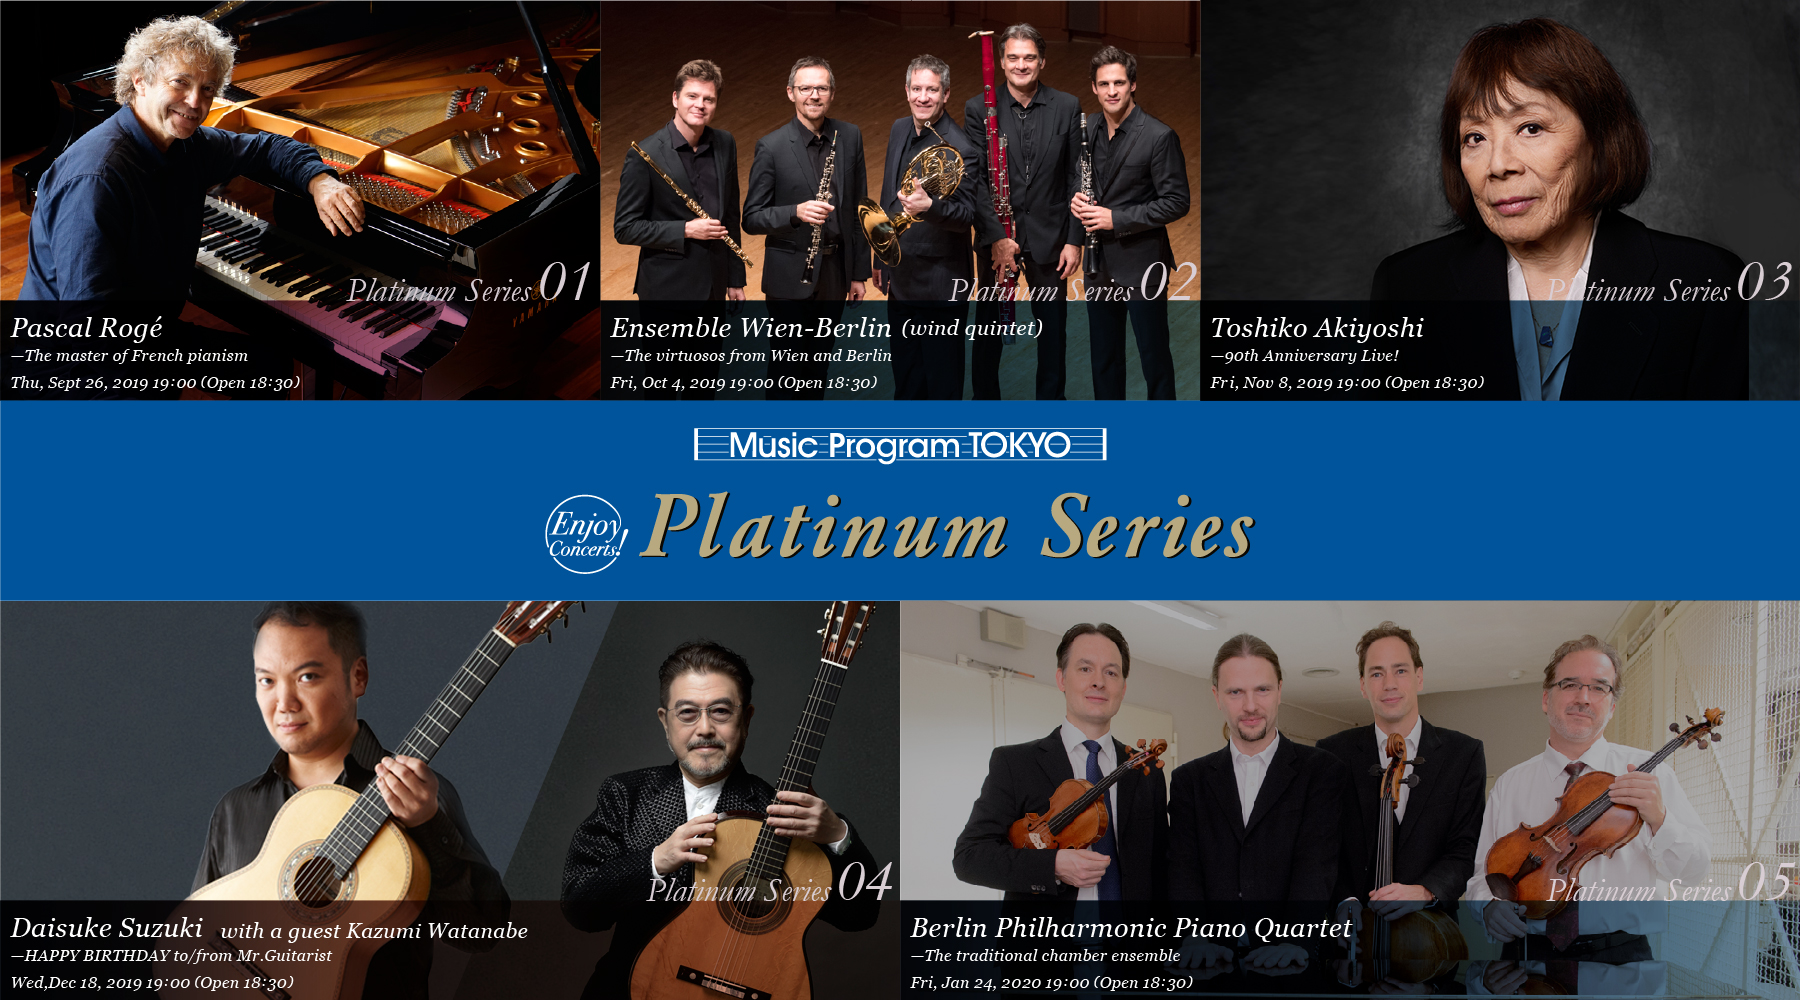 Music Program TOKYO Platinum Series